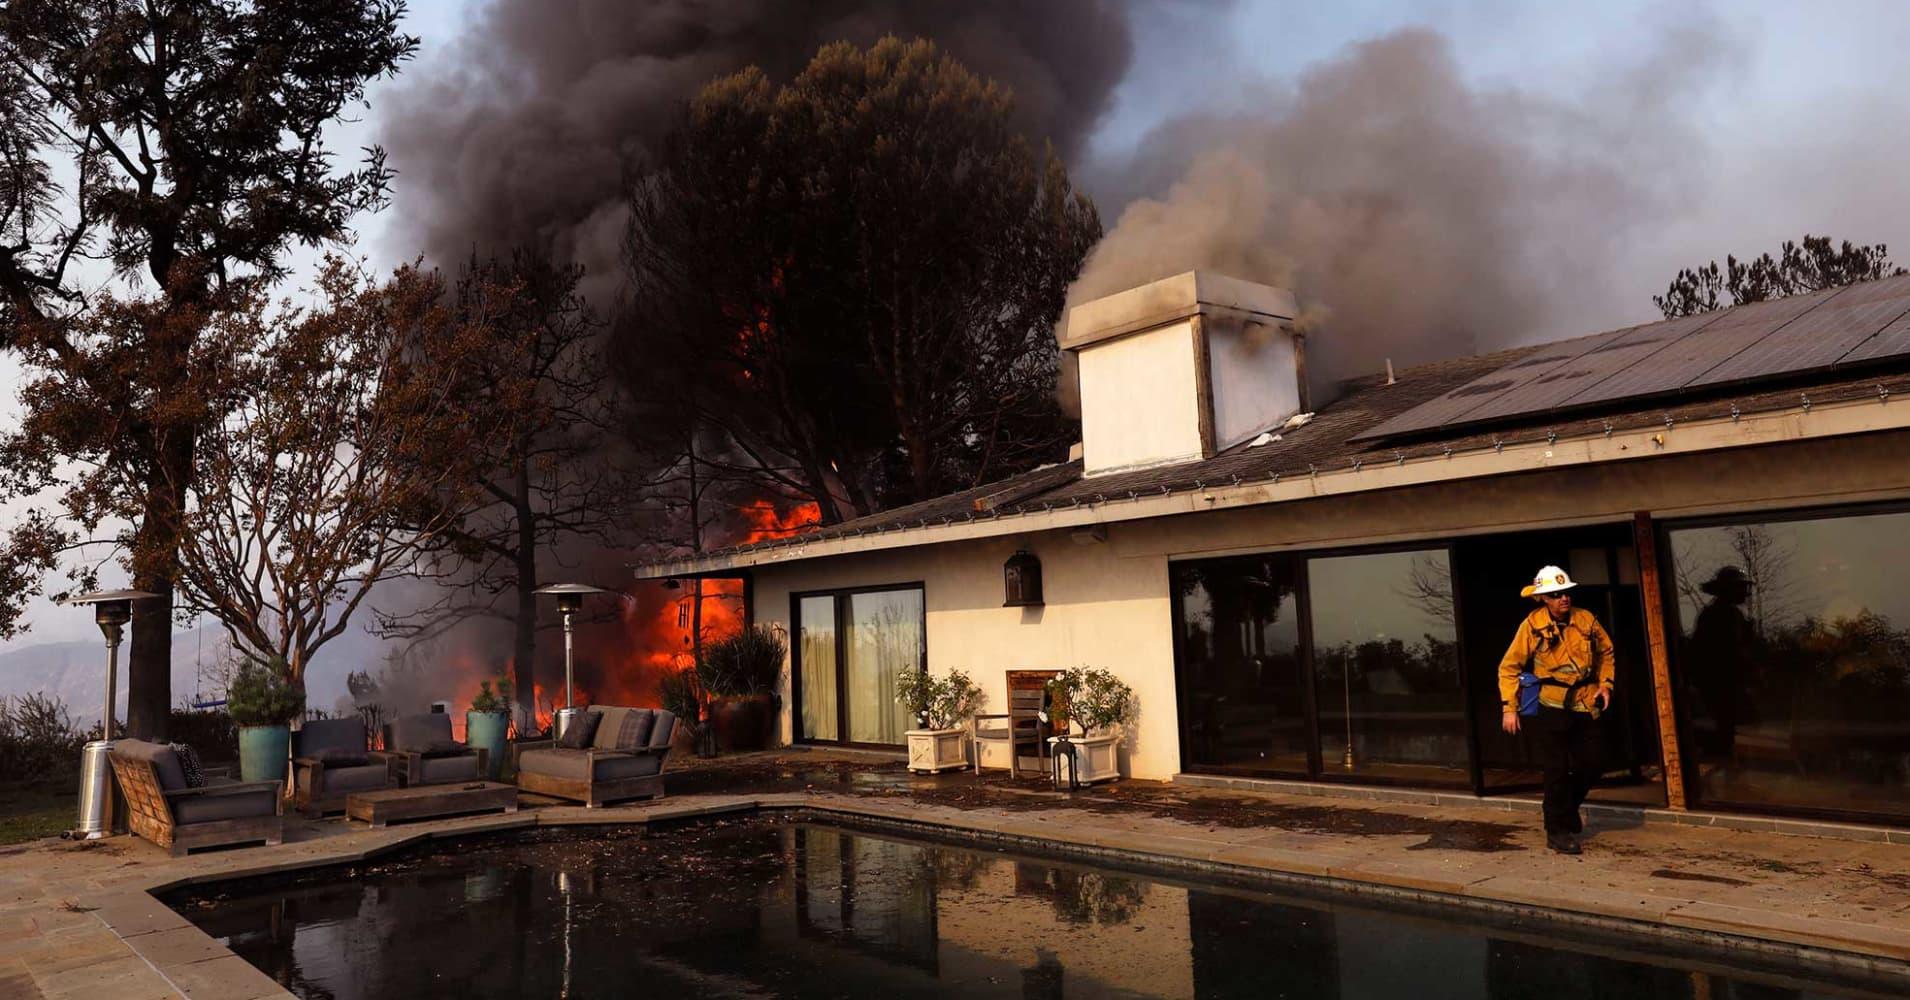 California S Big Fire Losses In 2017 Won T Mean Huge